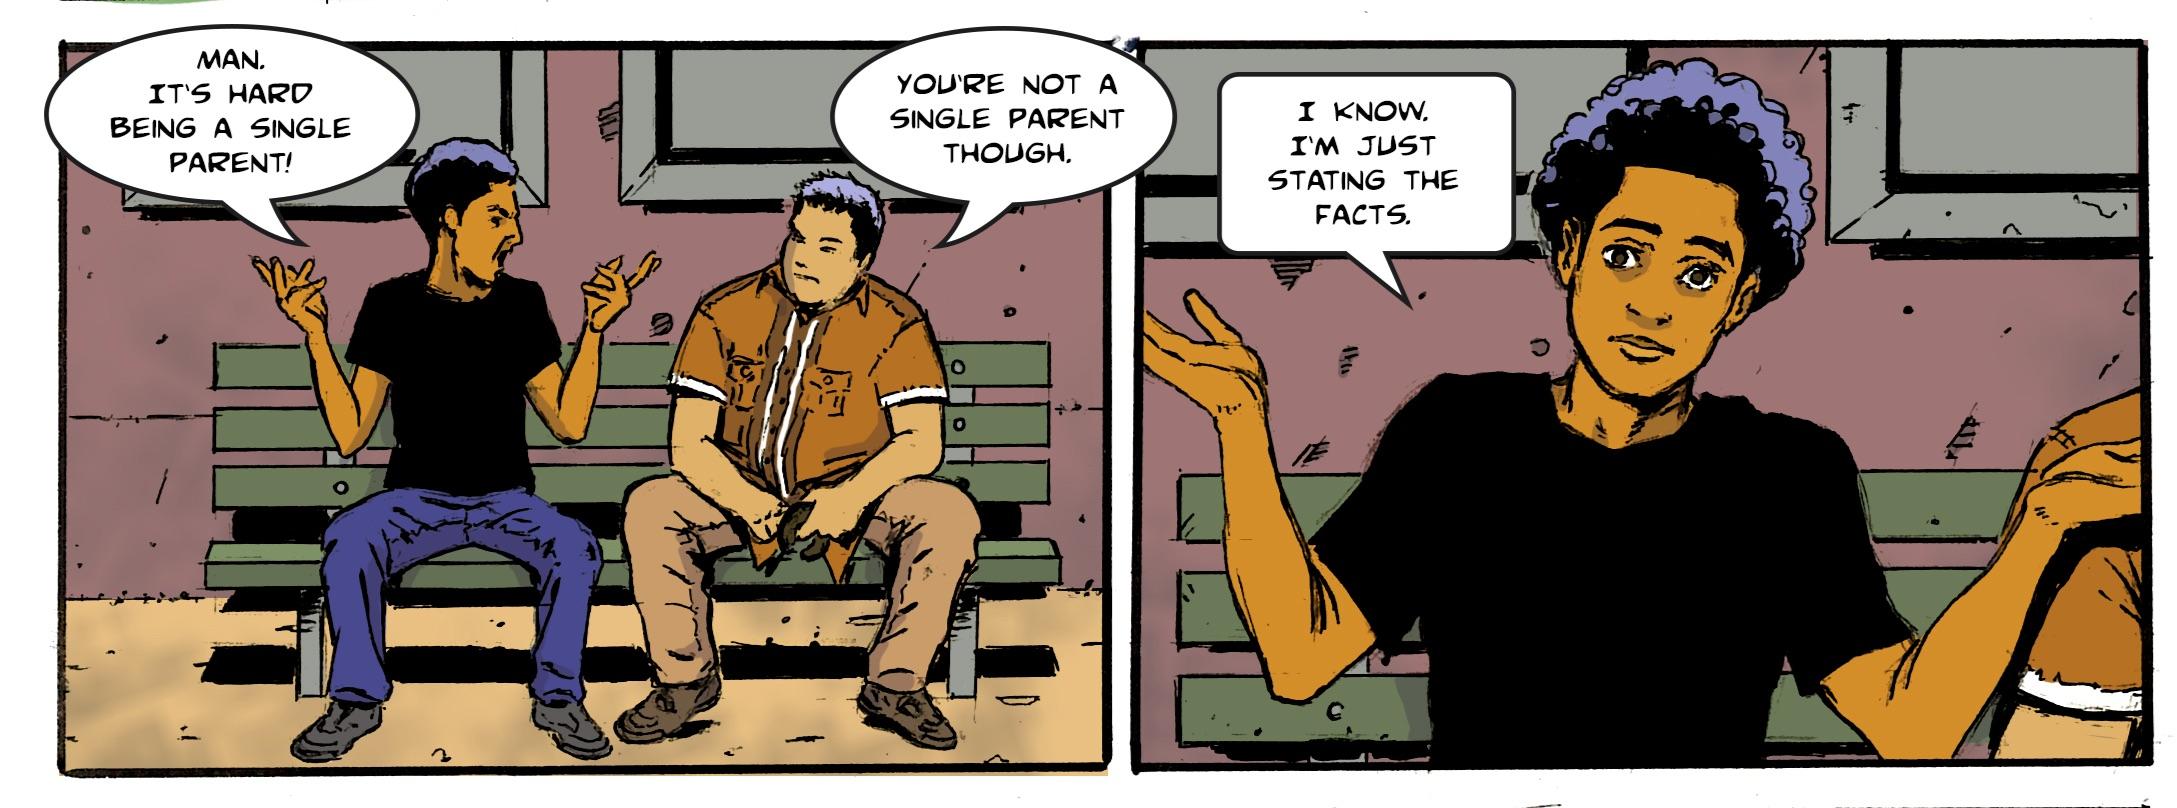 (H)af Comic Strip #93.jpg